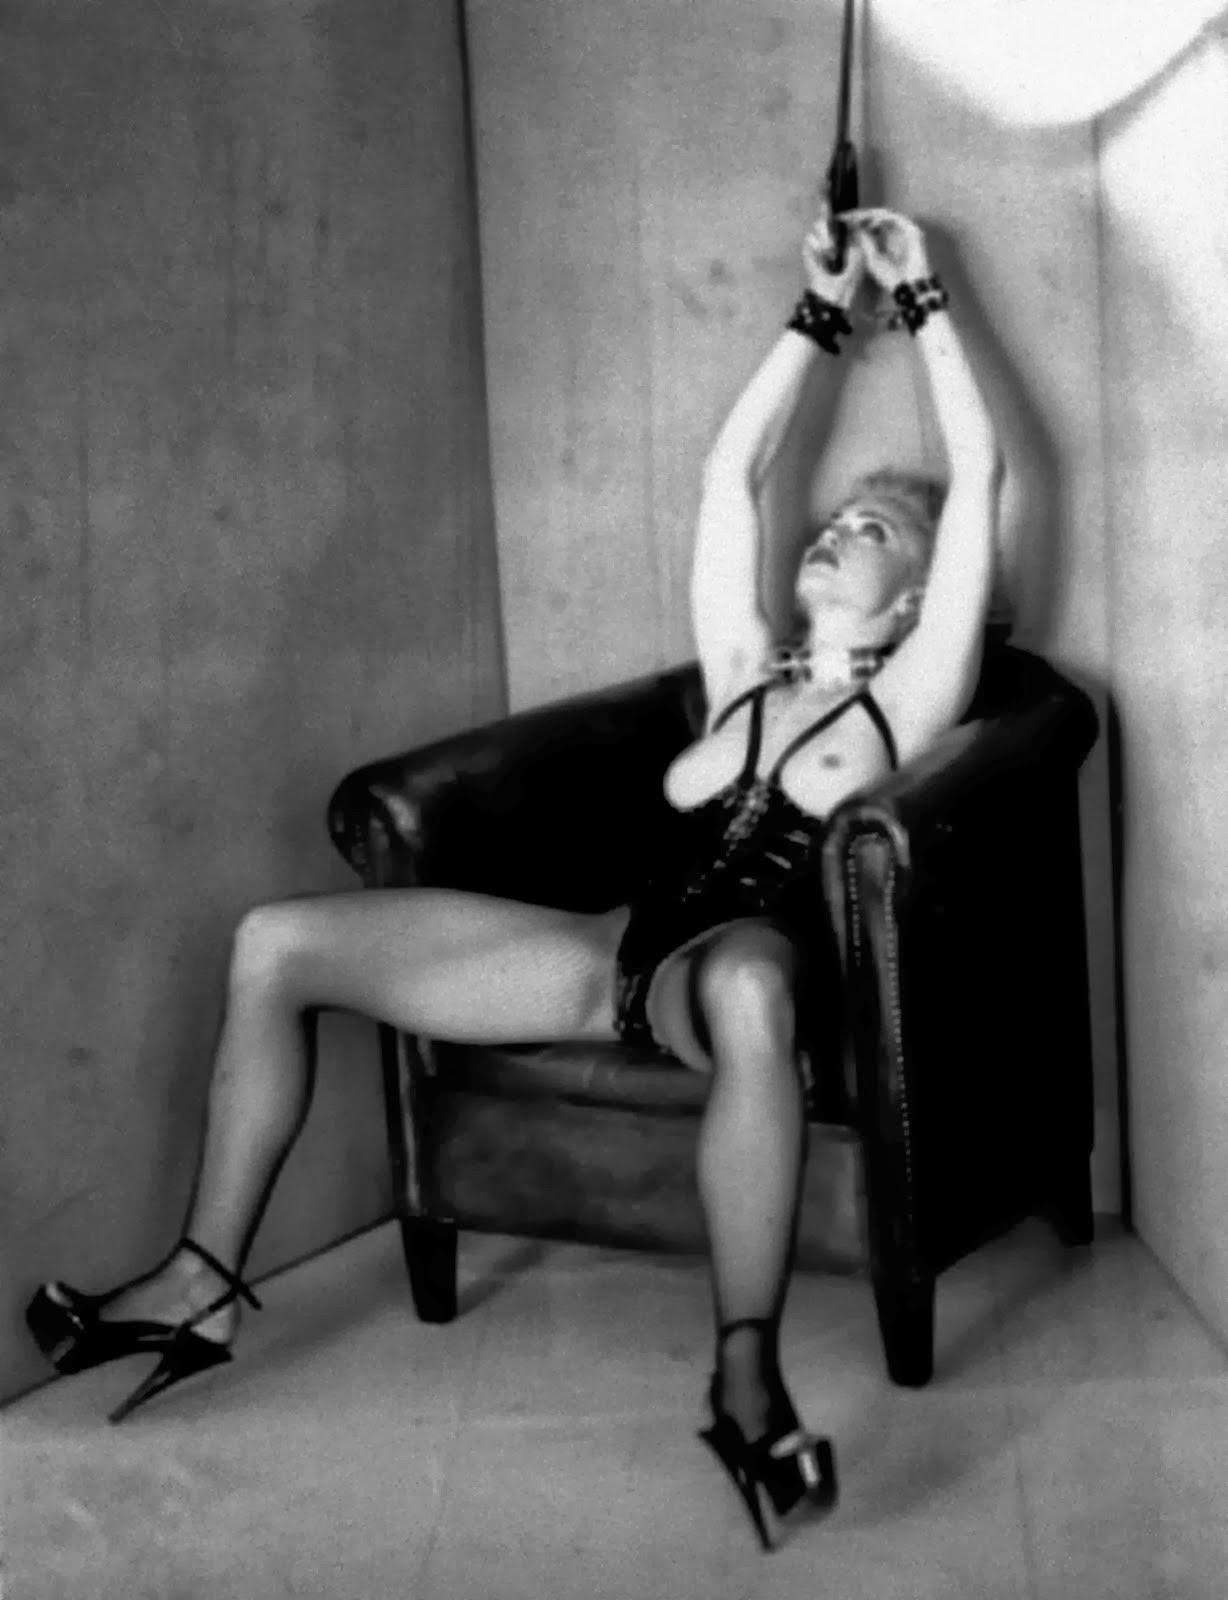 book-photos-madonna-porn-ashvaria-hot-topless-cumshut